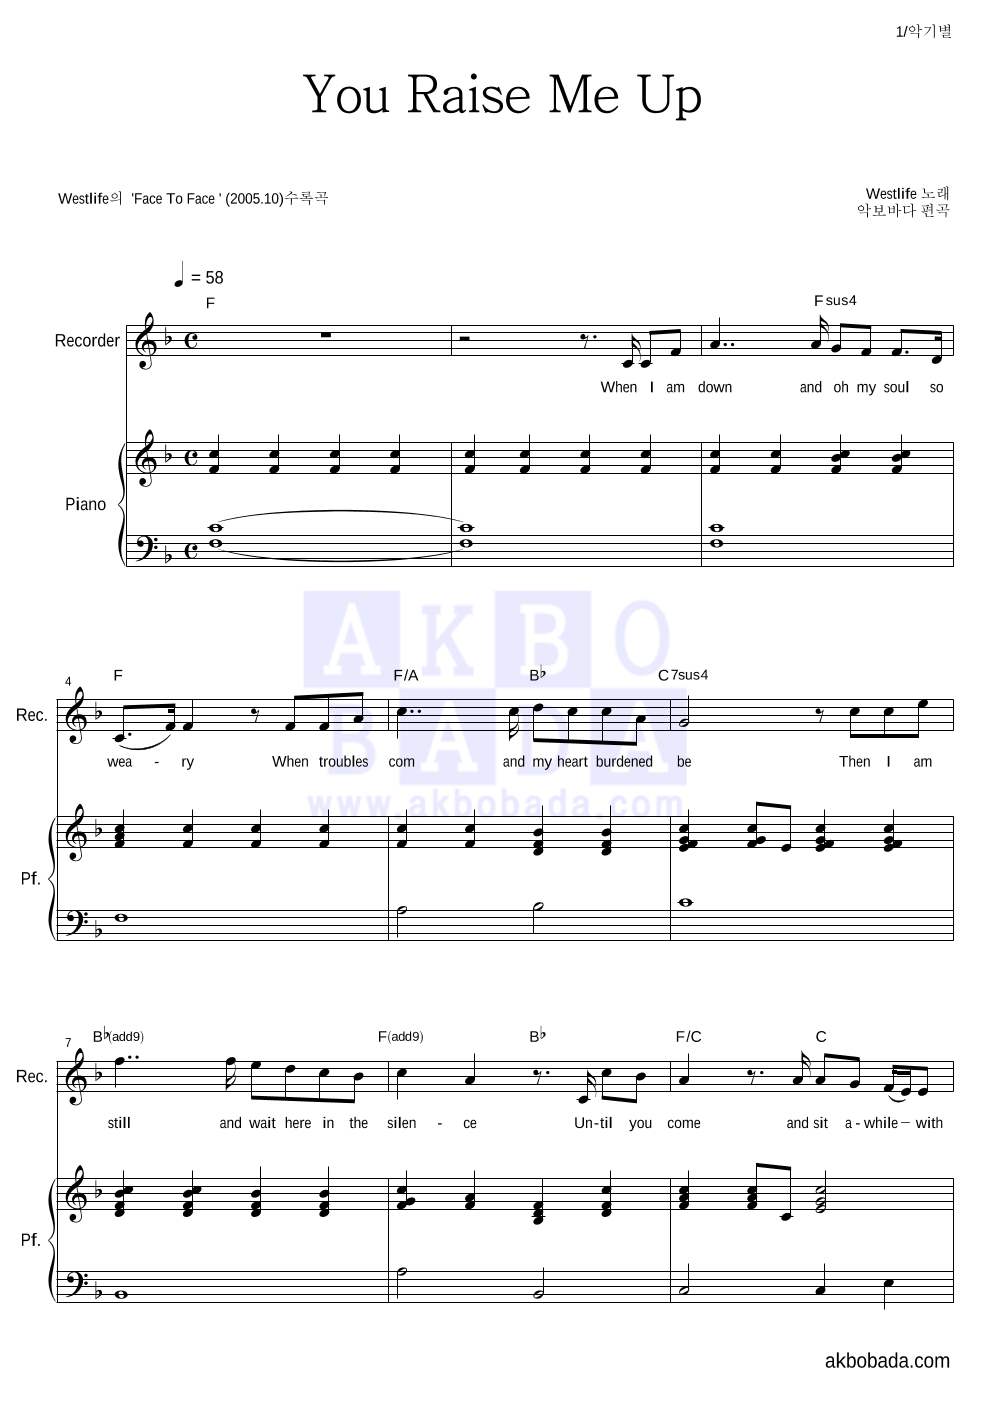 Westlife - You Raise Me Up 리코더&피아노 악보